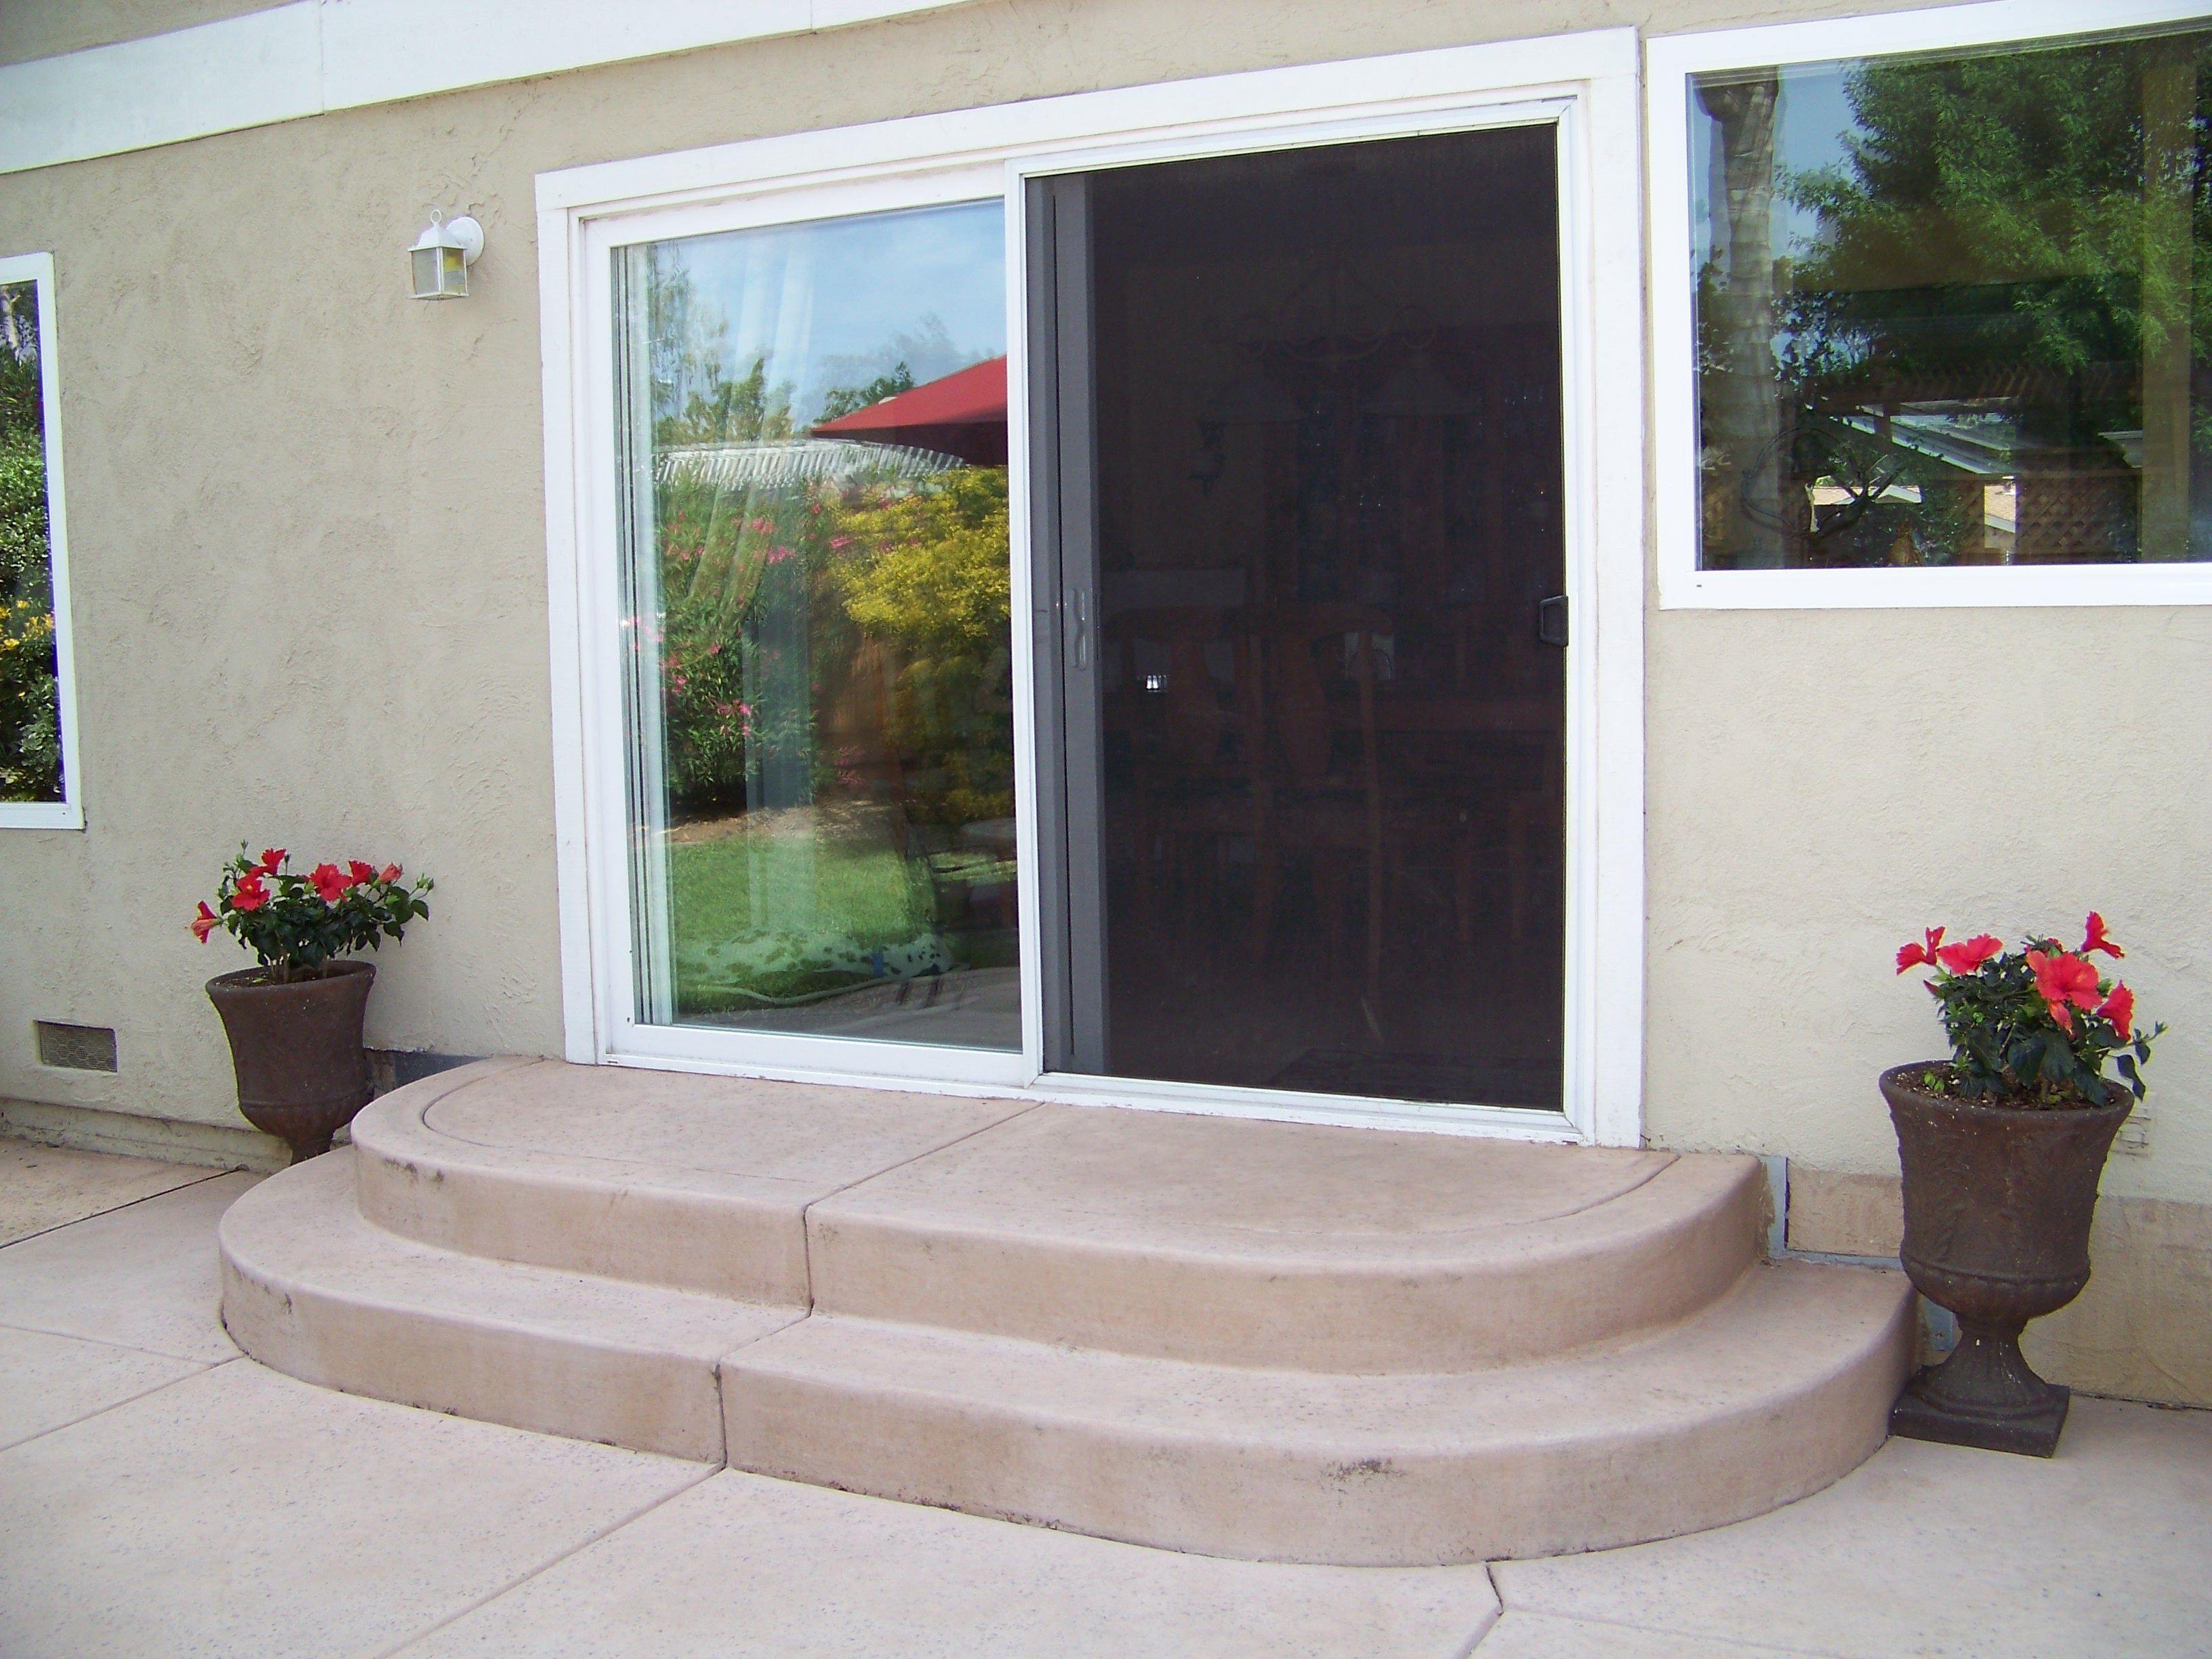 Best Rounded Concrete Patio Steps Dream Backyard Patio 400 x 300